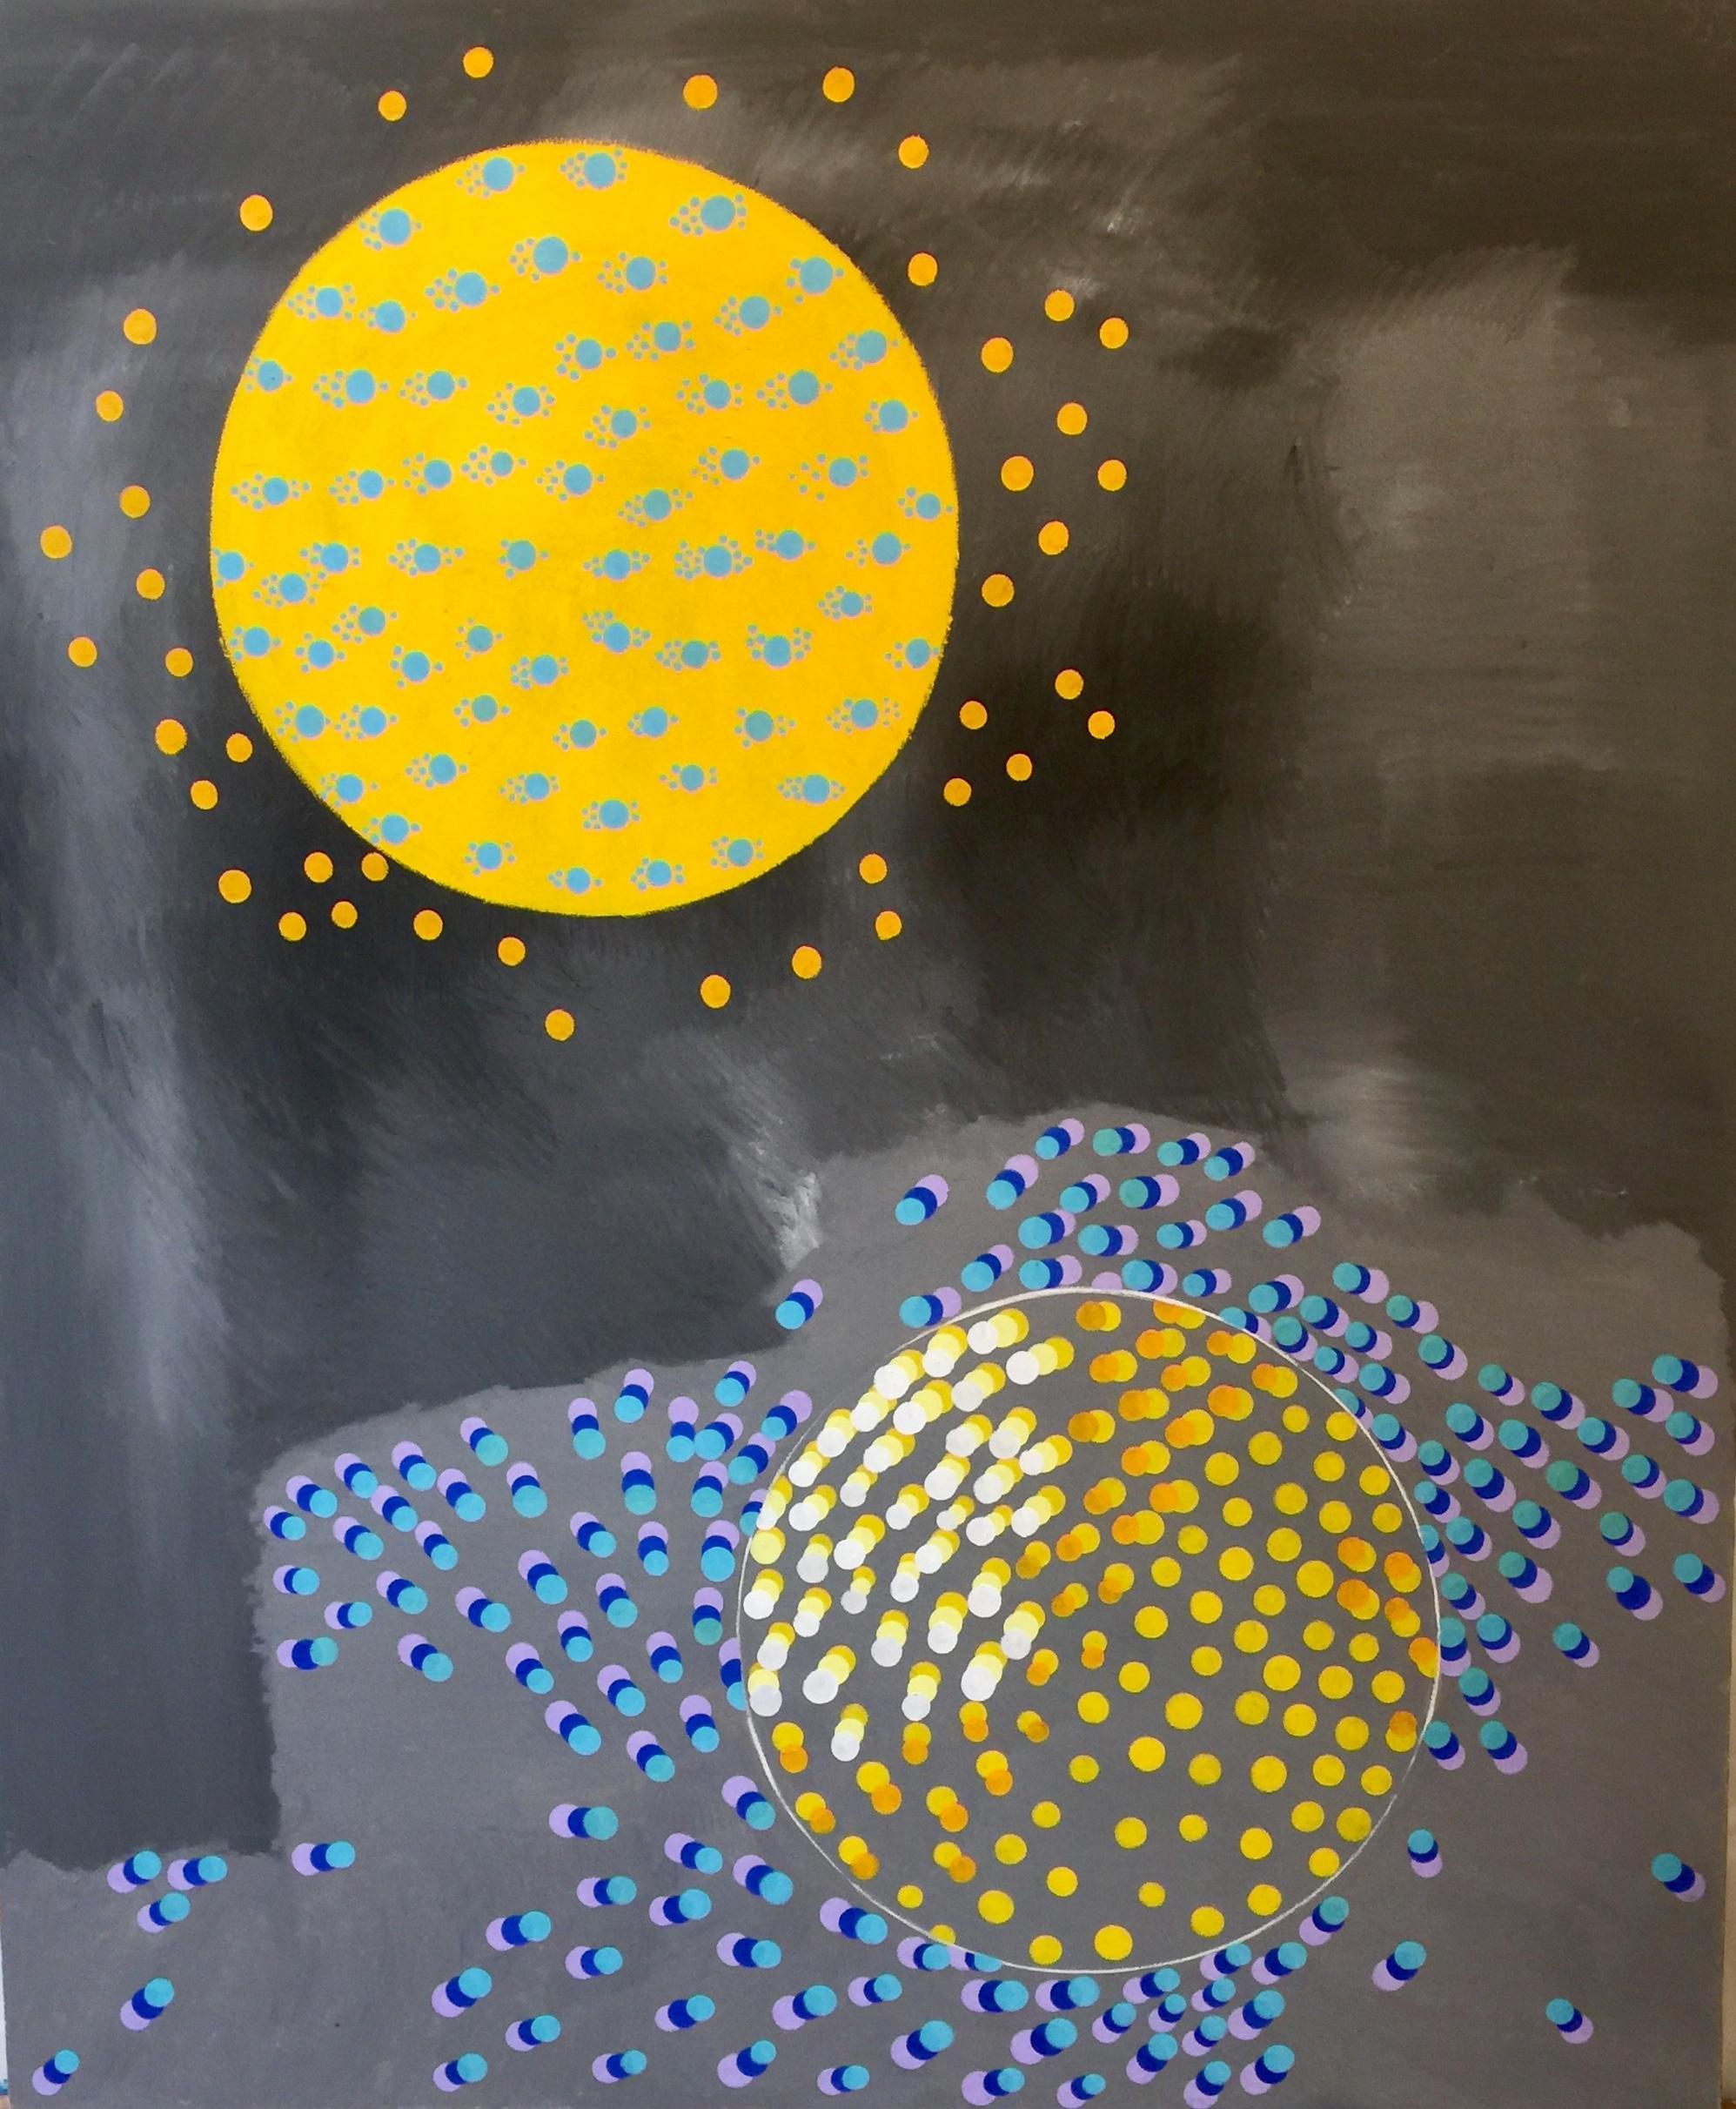 Large Pop Art Painting: 'Lunar Landing'